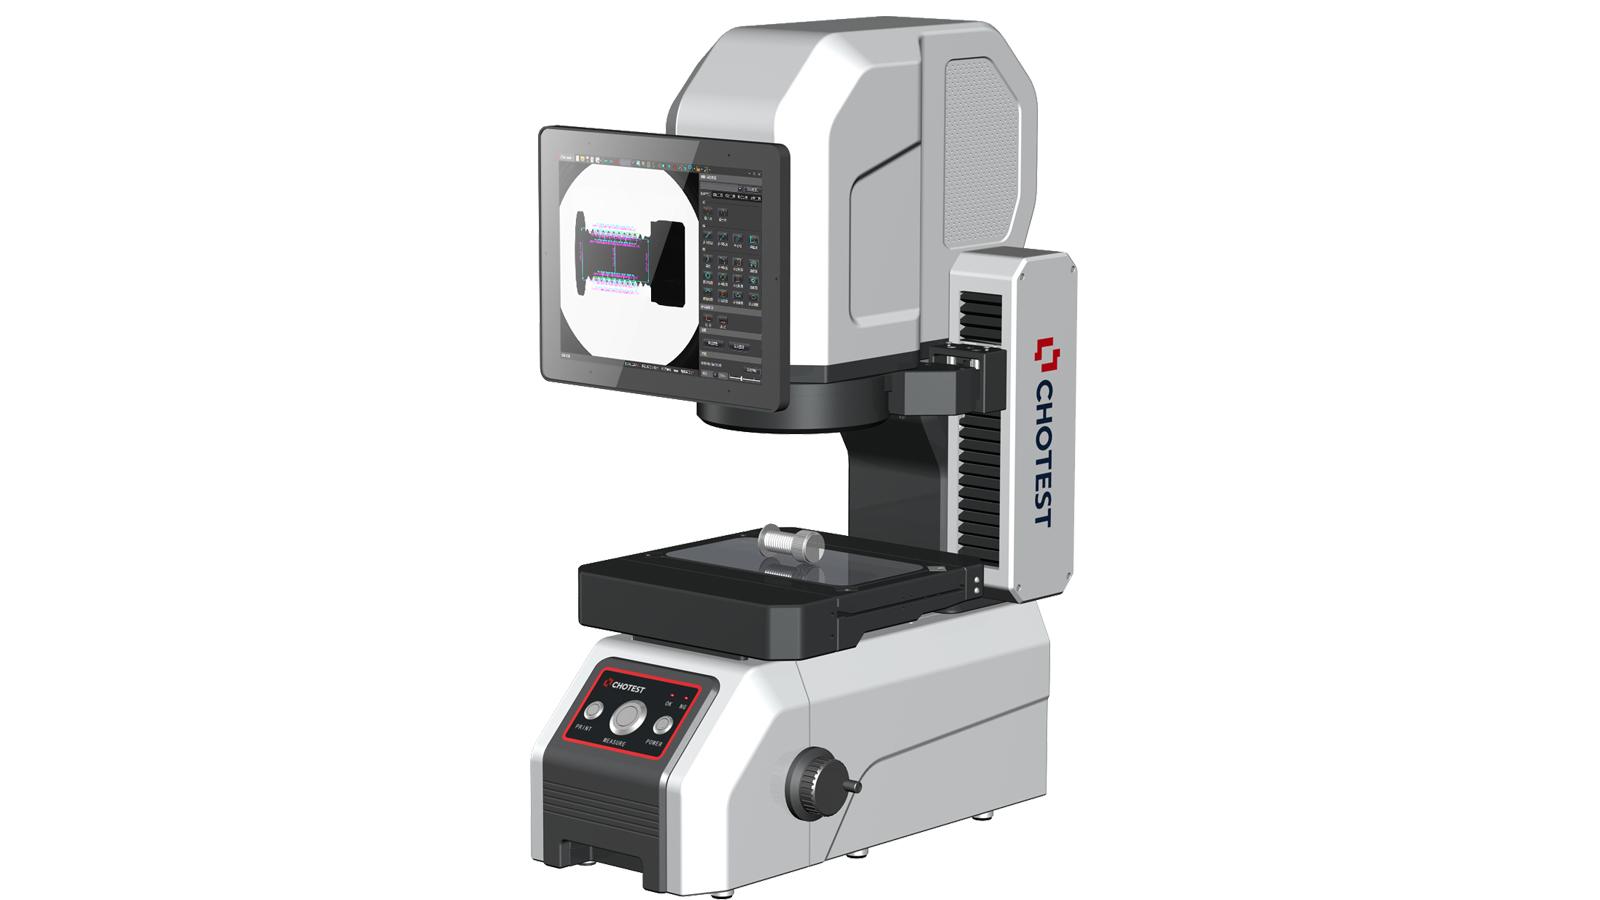 VX3000系列閃測儀,大視野整體成像,一鍵測量